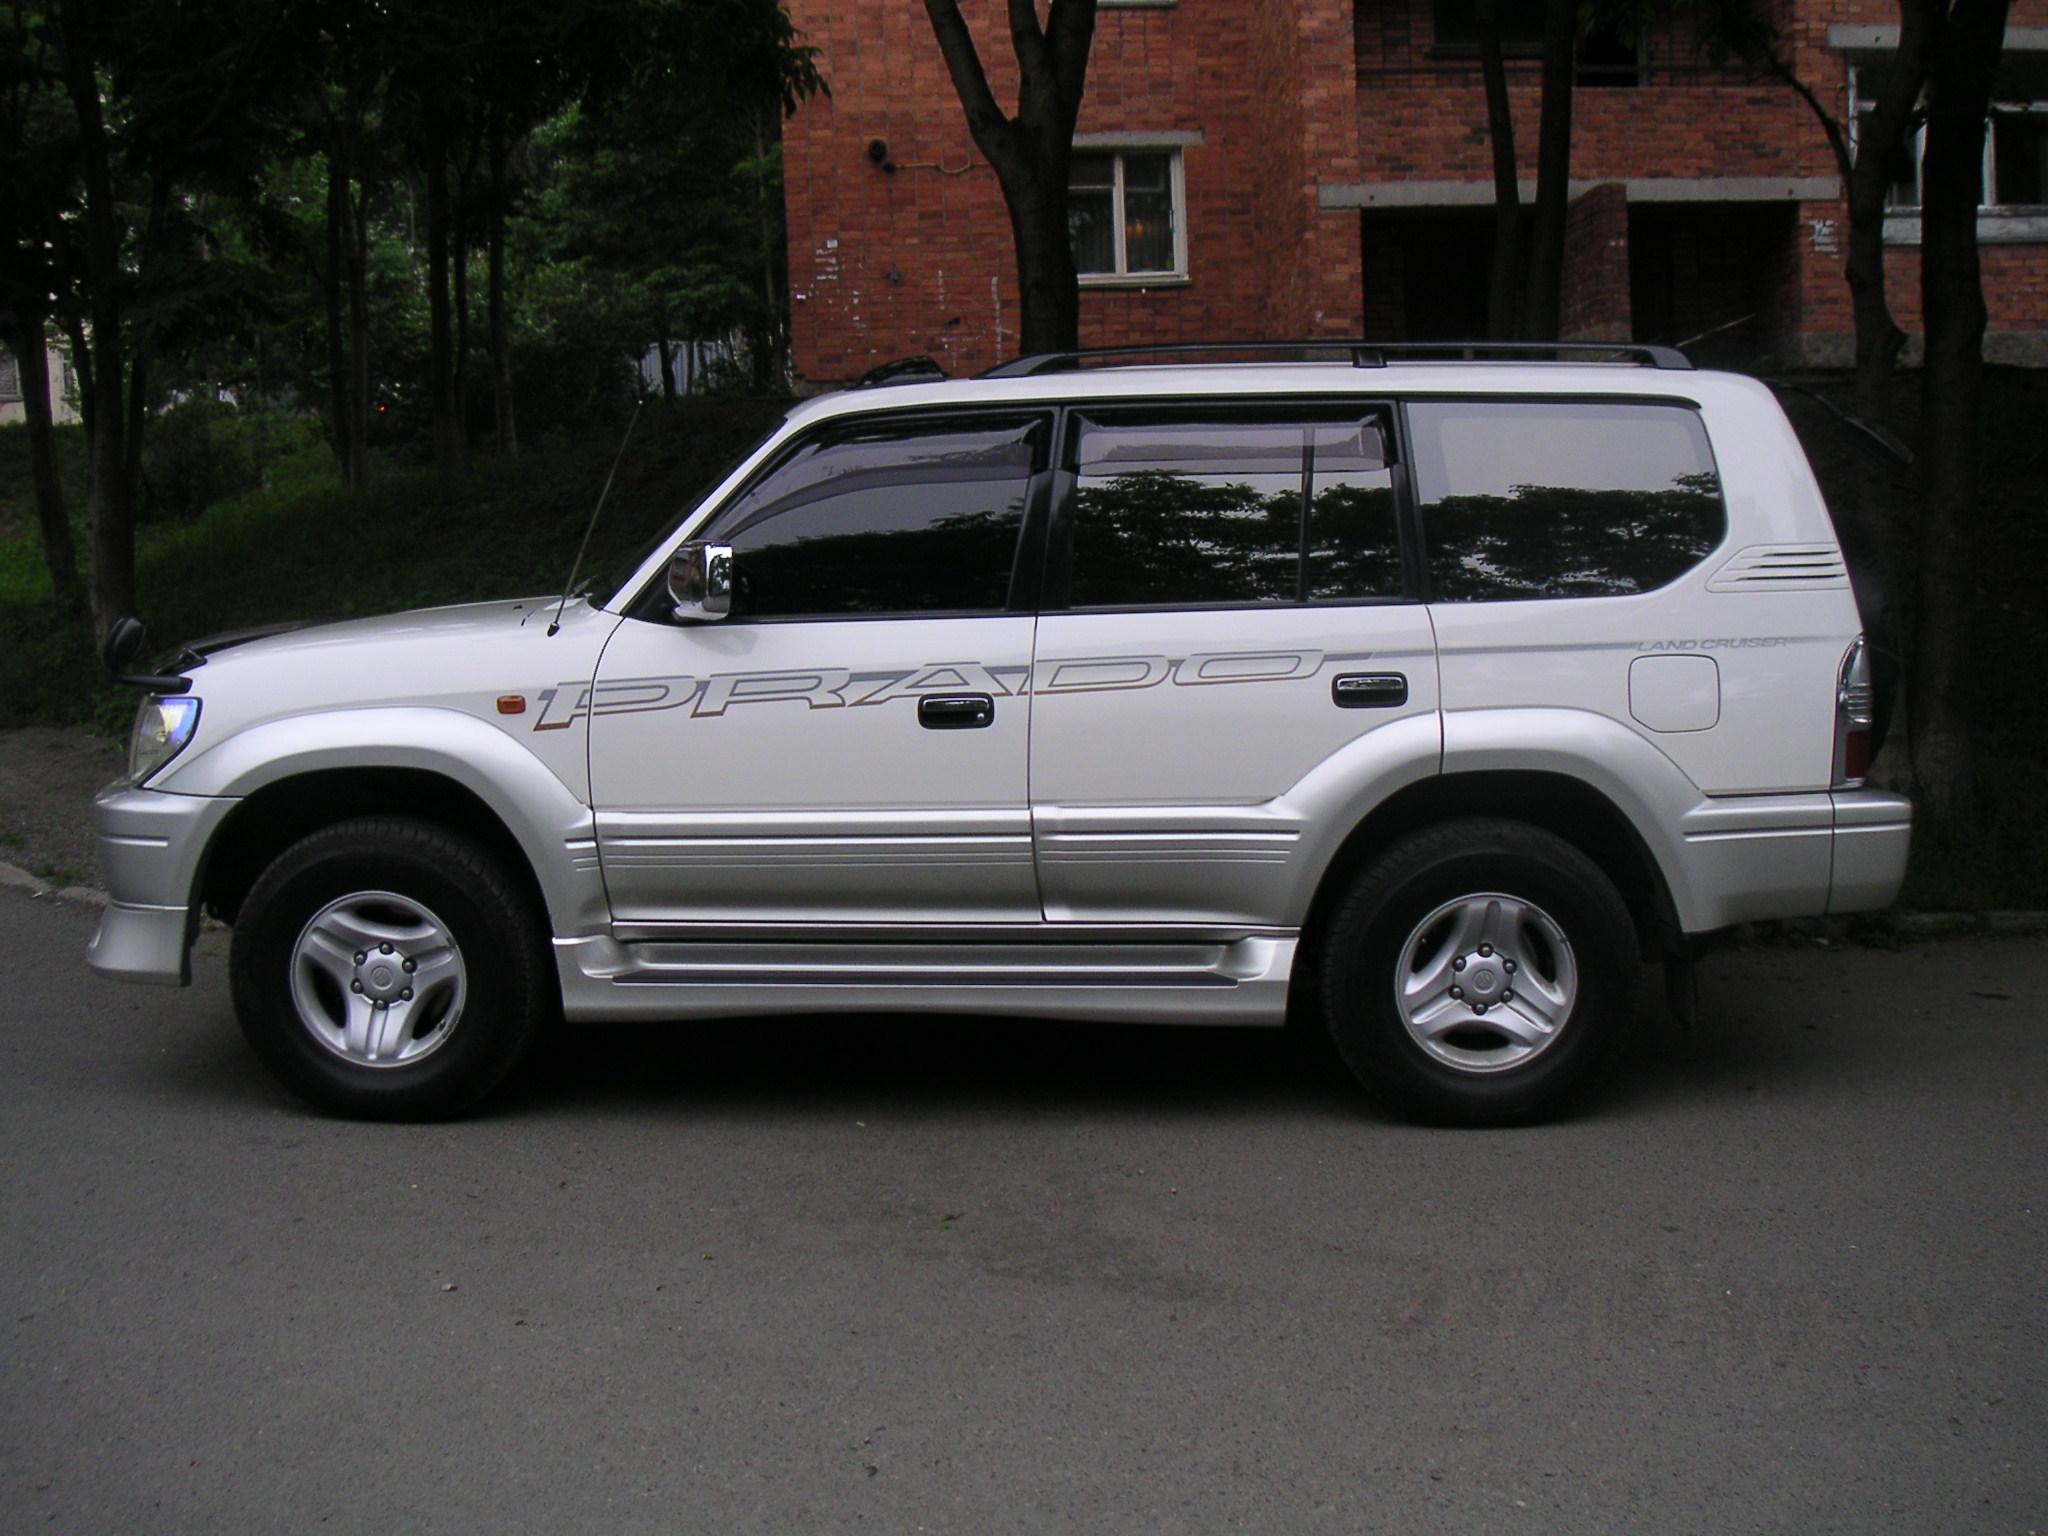 2000 toyota land cruiser prado pictures 3000cc diesel automatic for sale. Black Bedroom Furniture Sets. Home Design Ideas